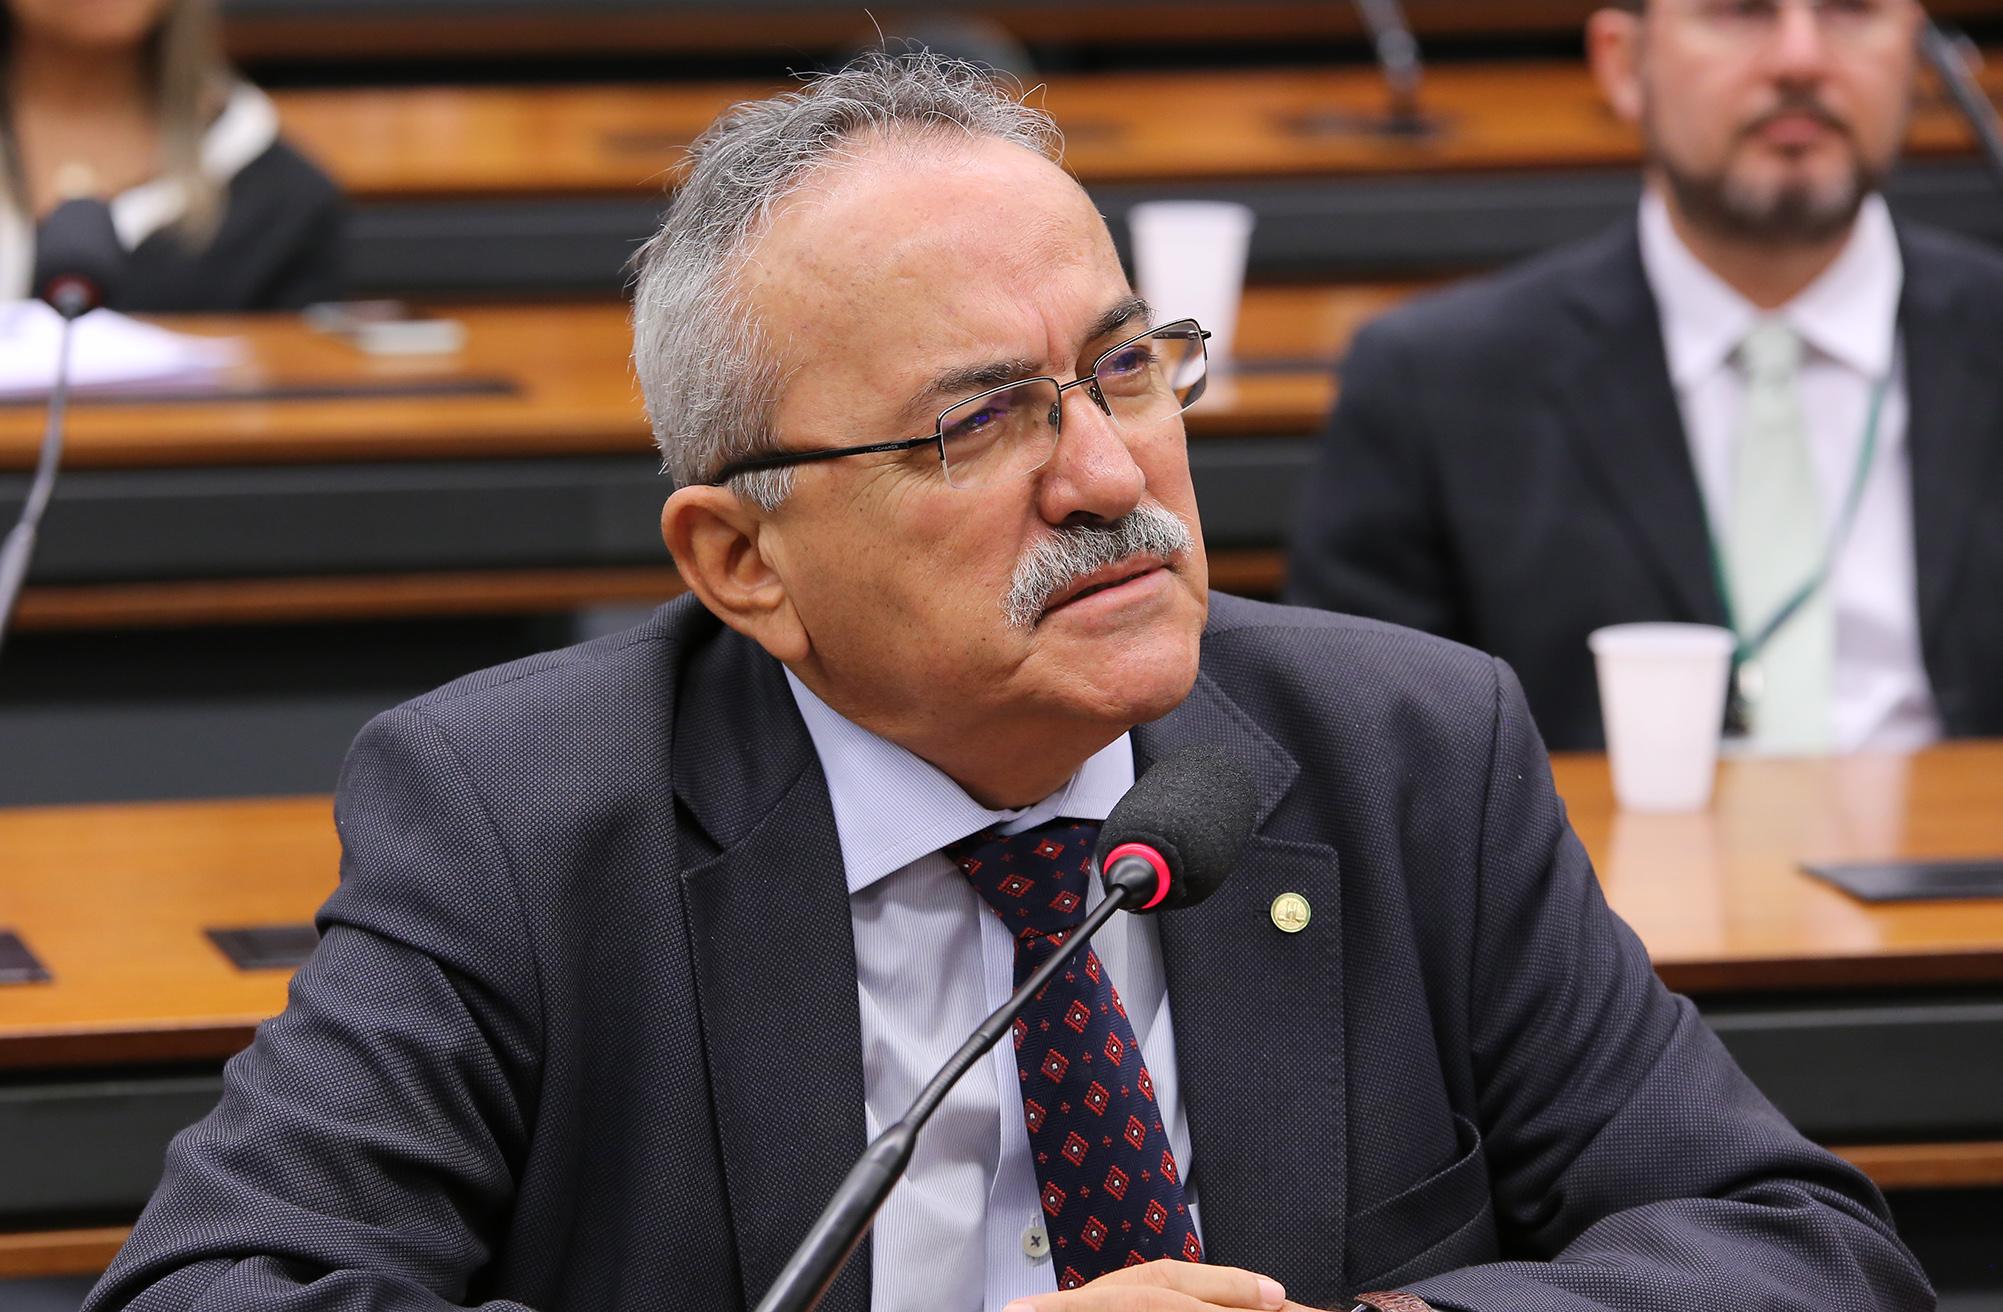 Deputado Federal Átila Lira (PSB-PI)